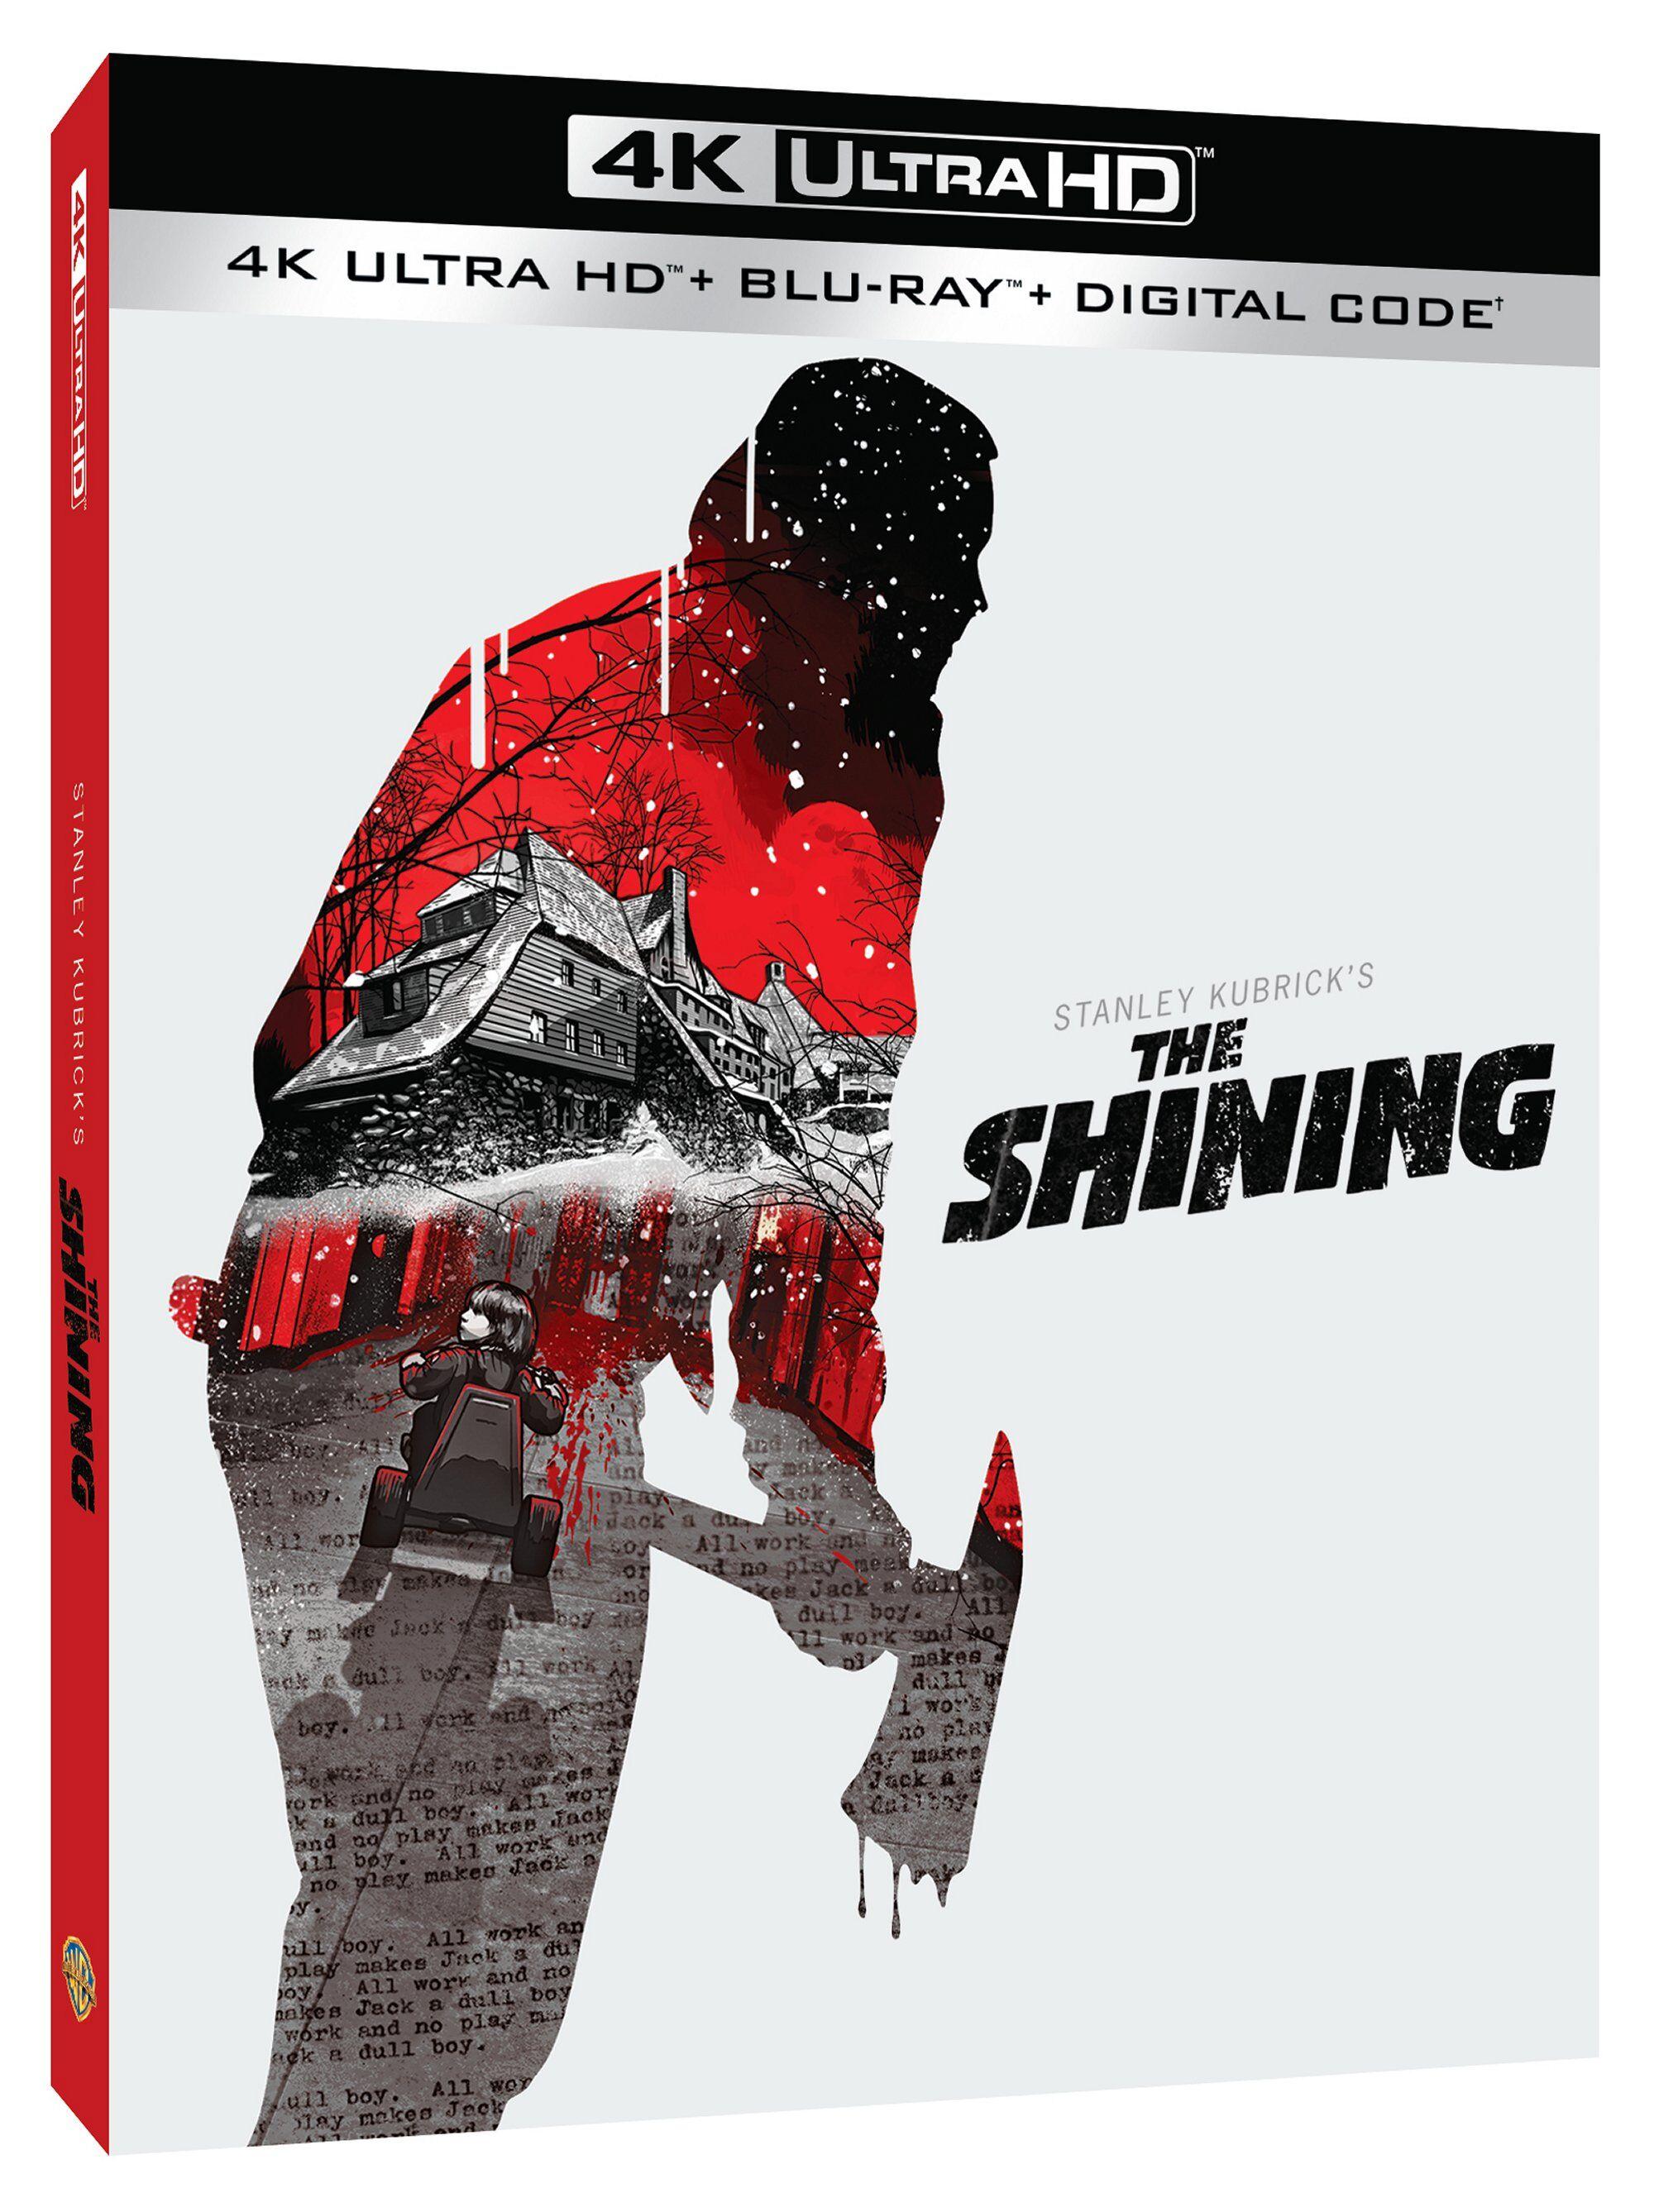 The Shining 4K Blu-ray Review